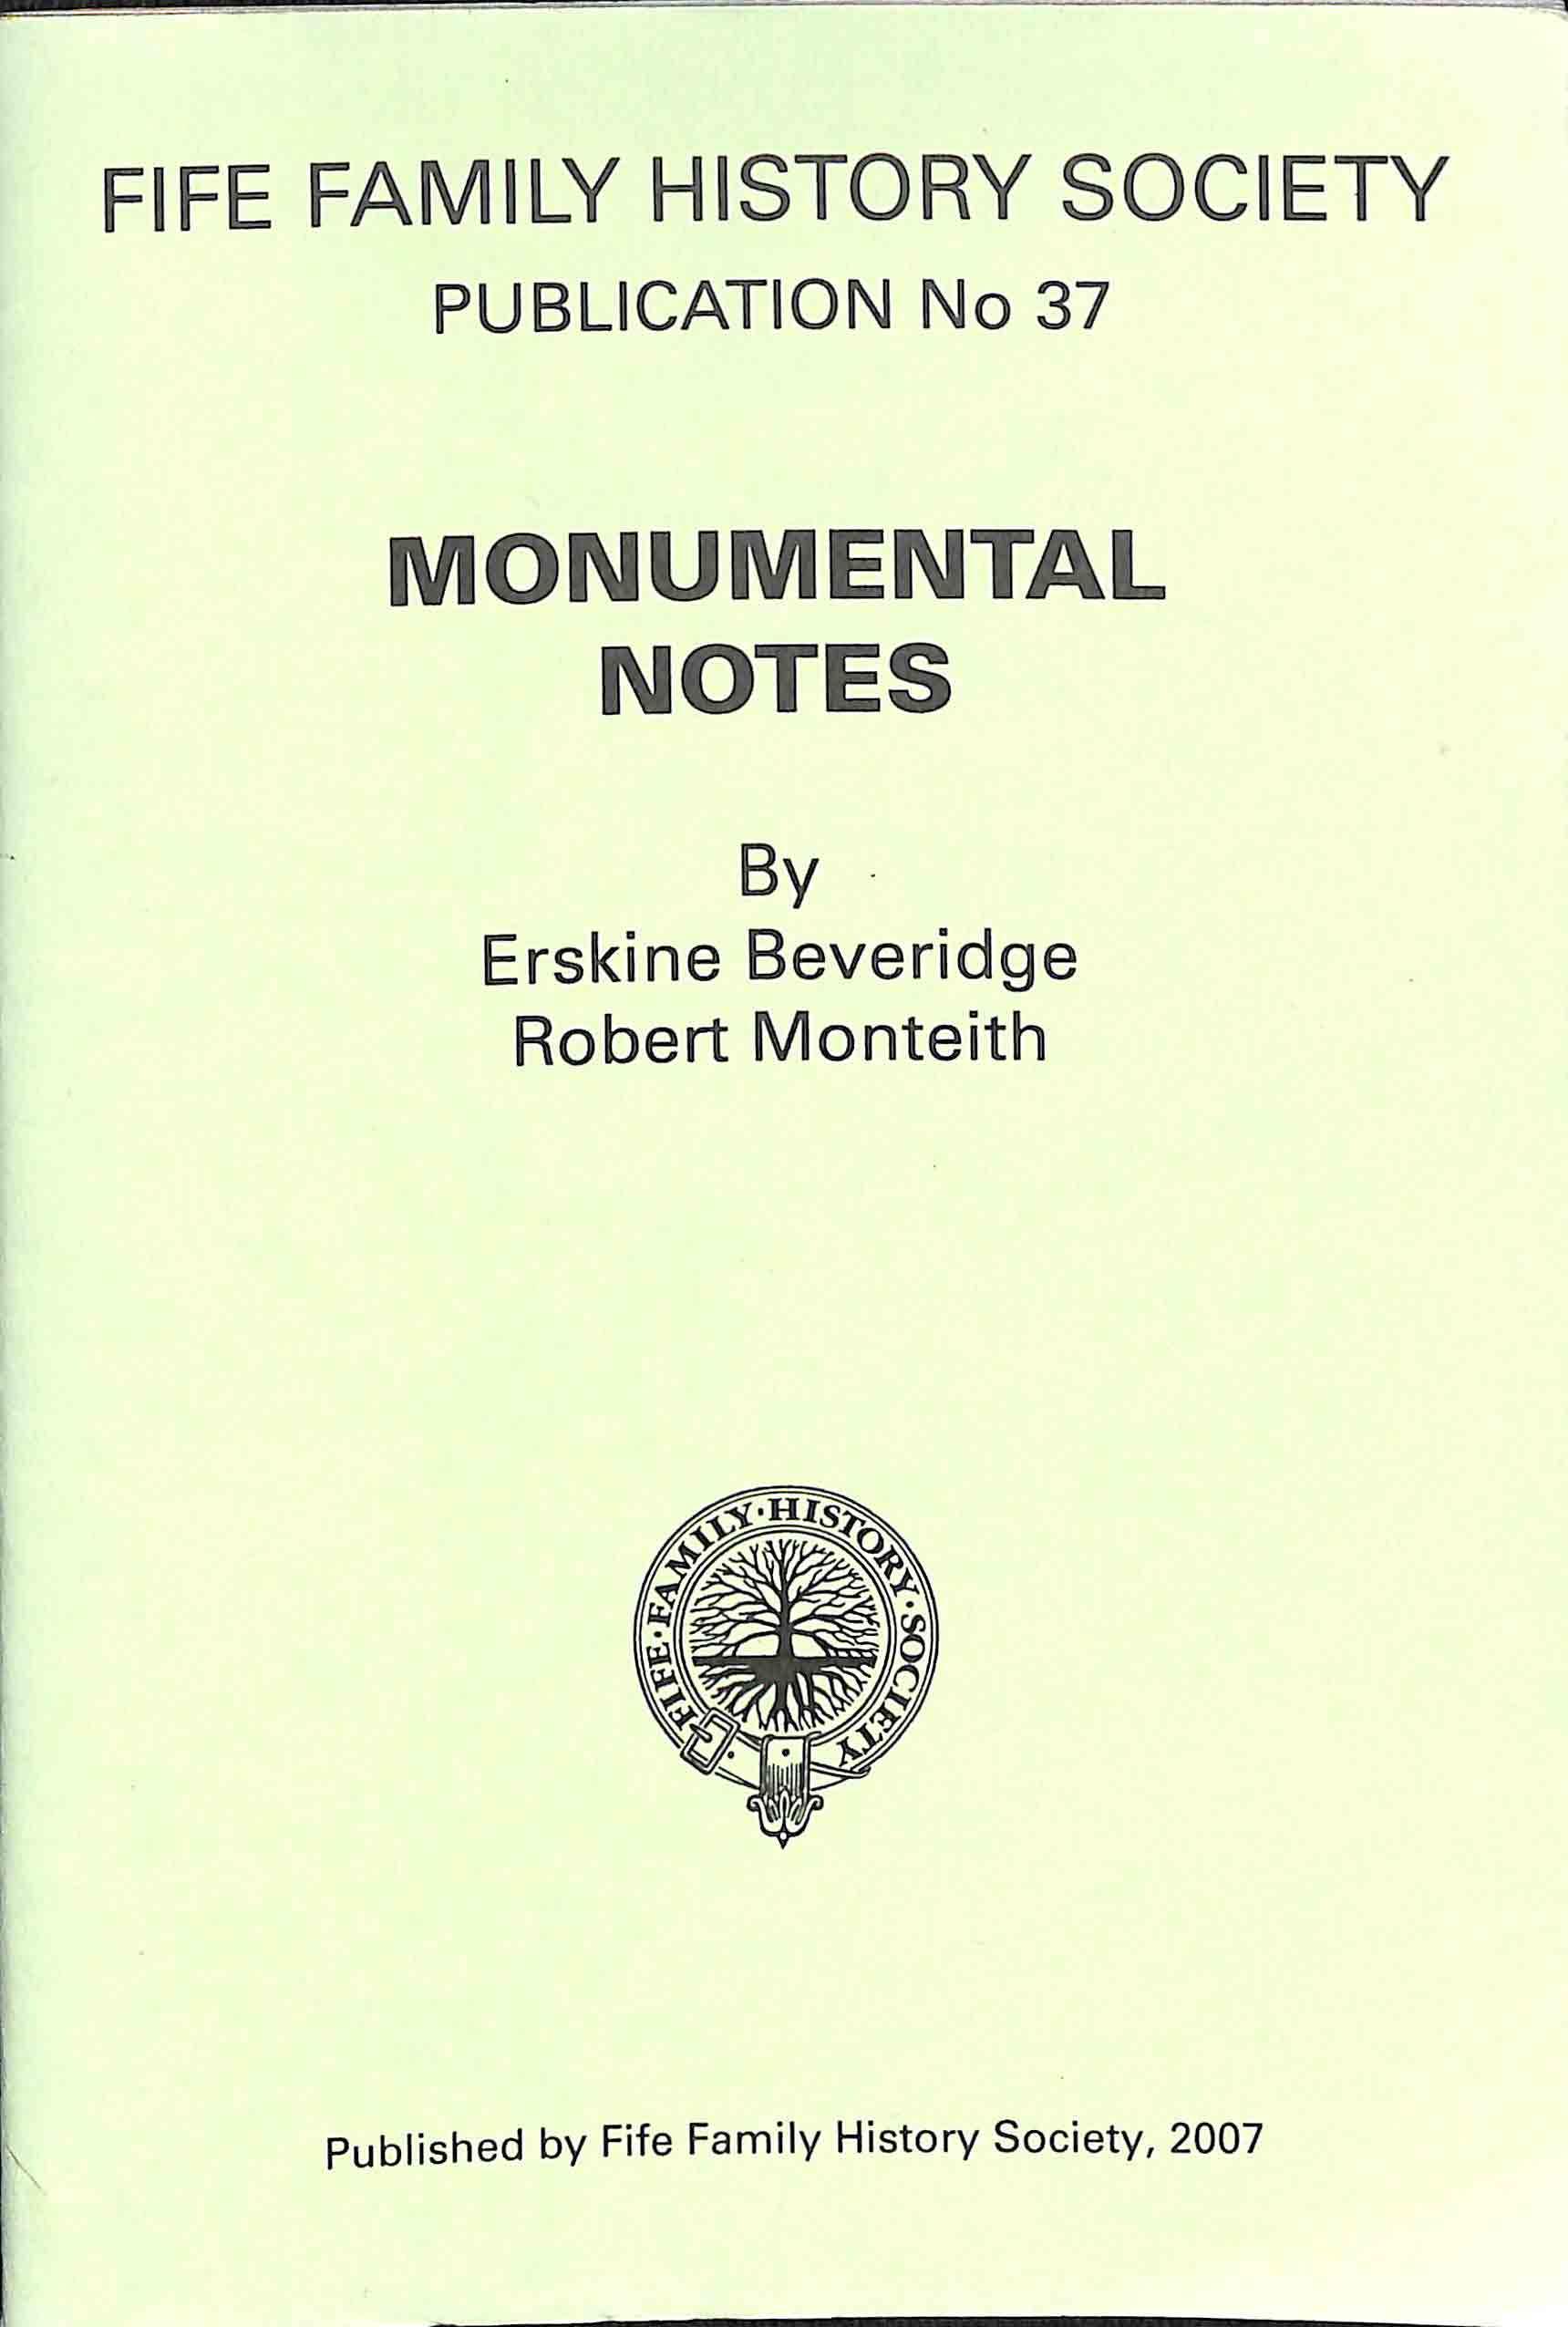 Publication No 37, Monumental notes